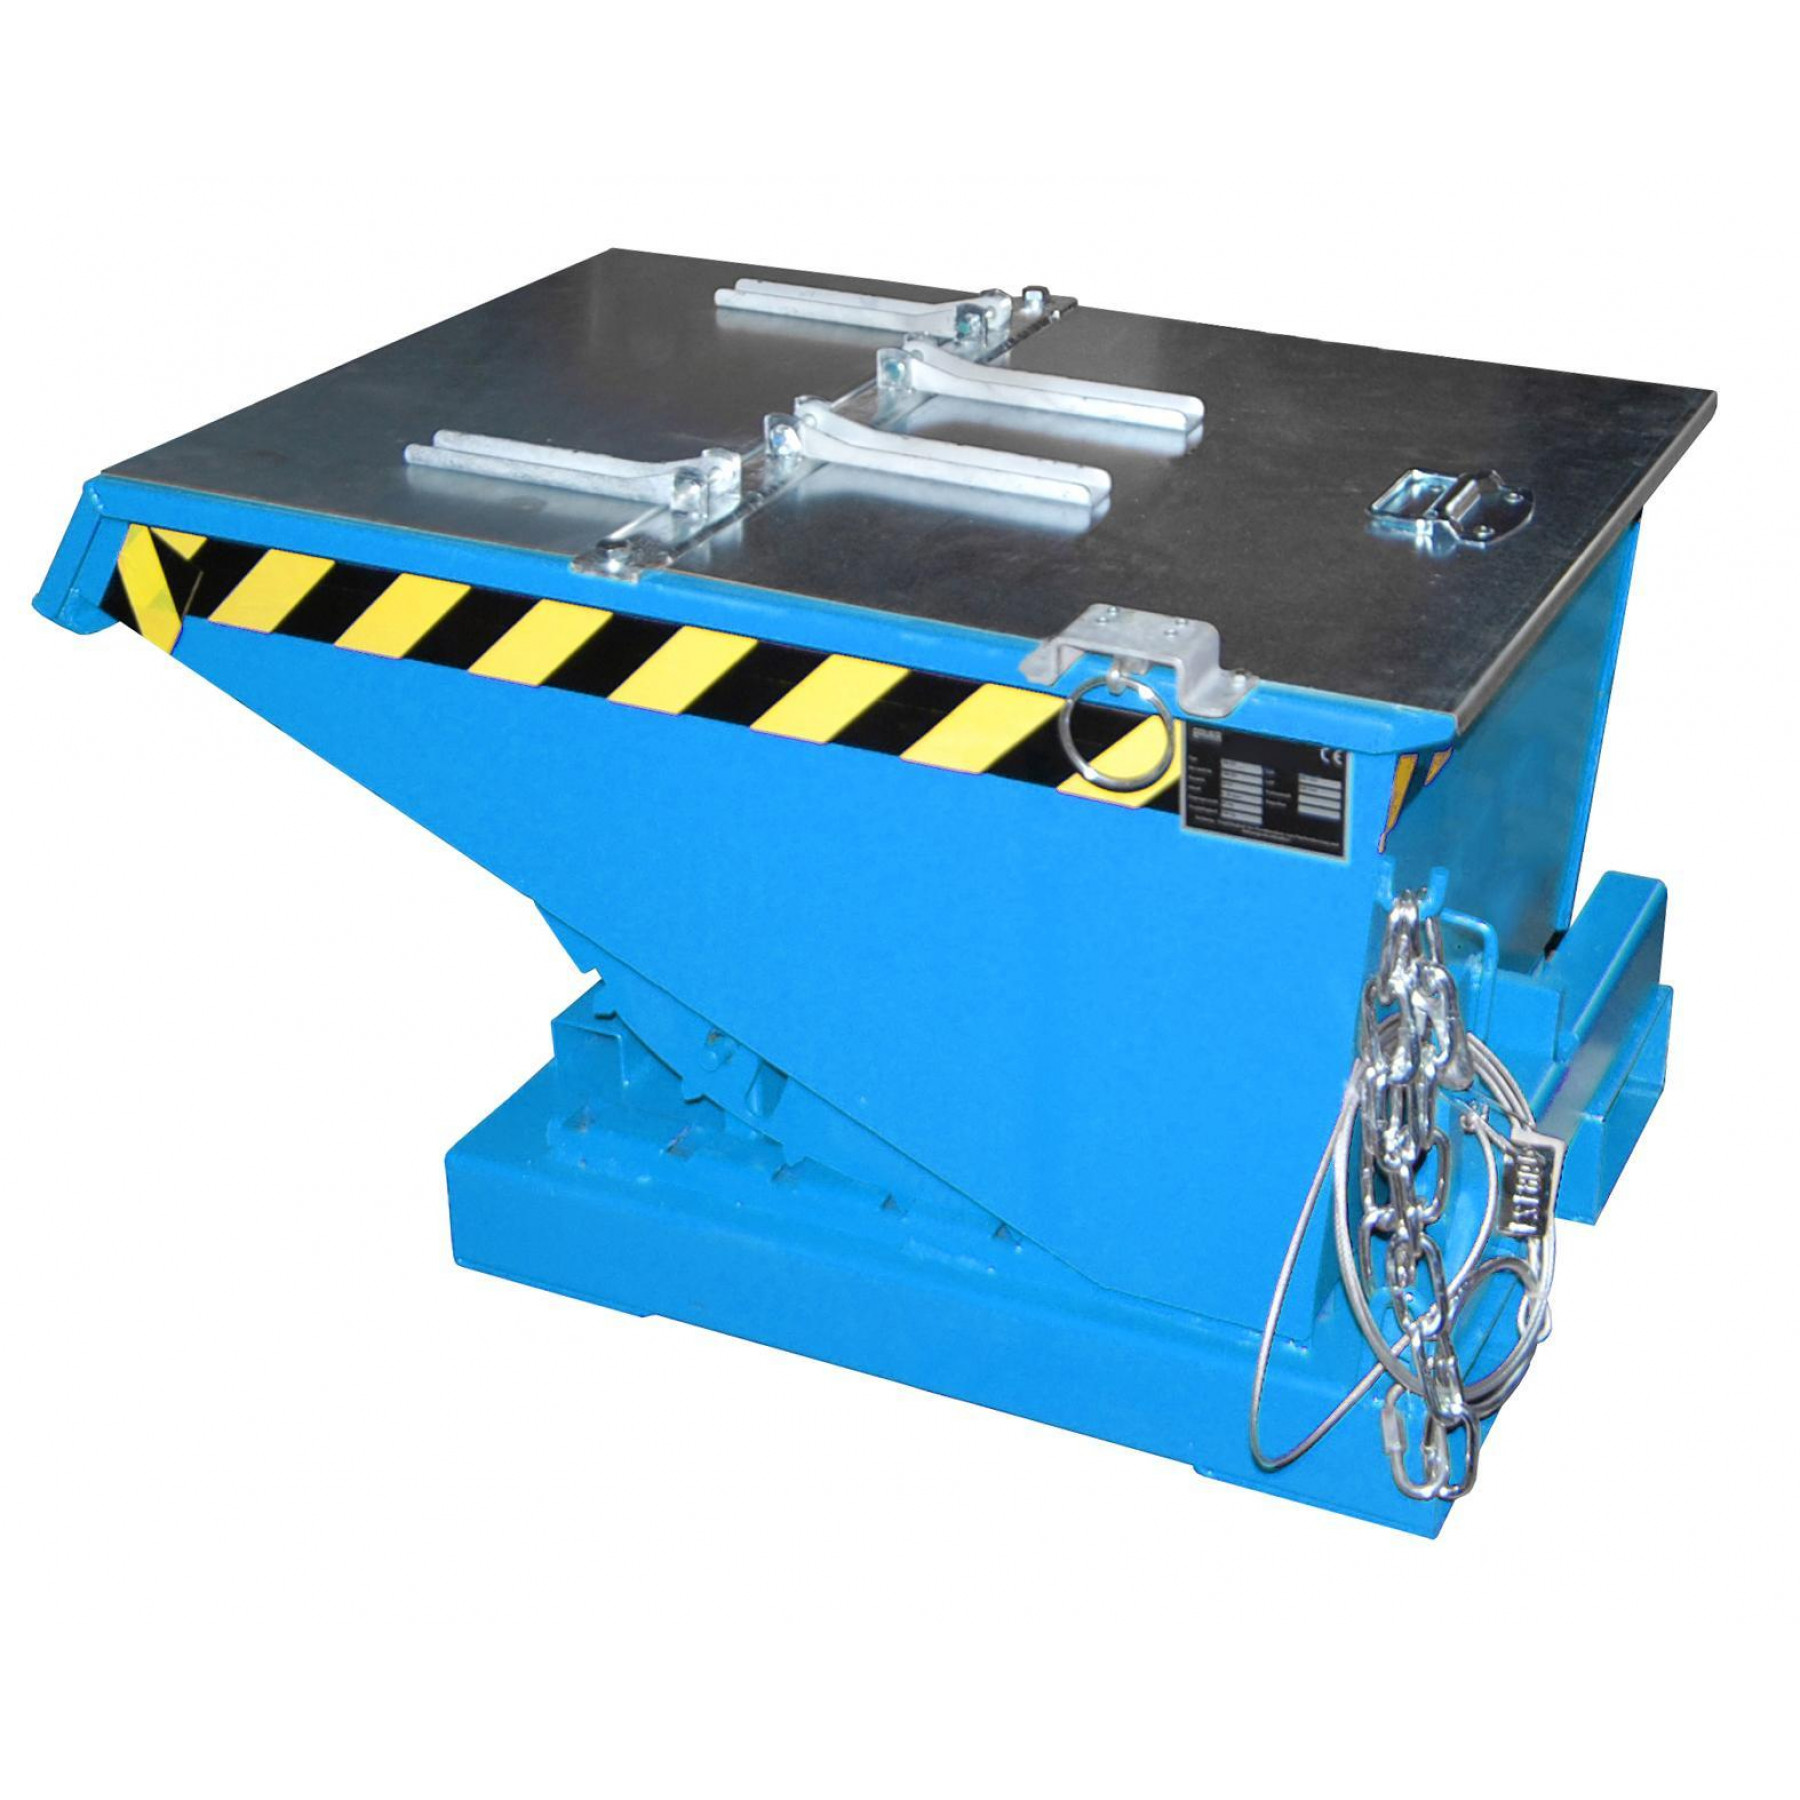 Verzinkt deksel t.b.v. kiepcontainer 150 liter, MTF-150-DEKSEL